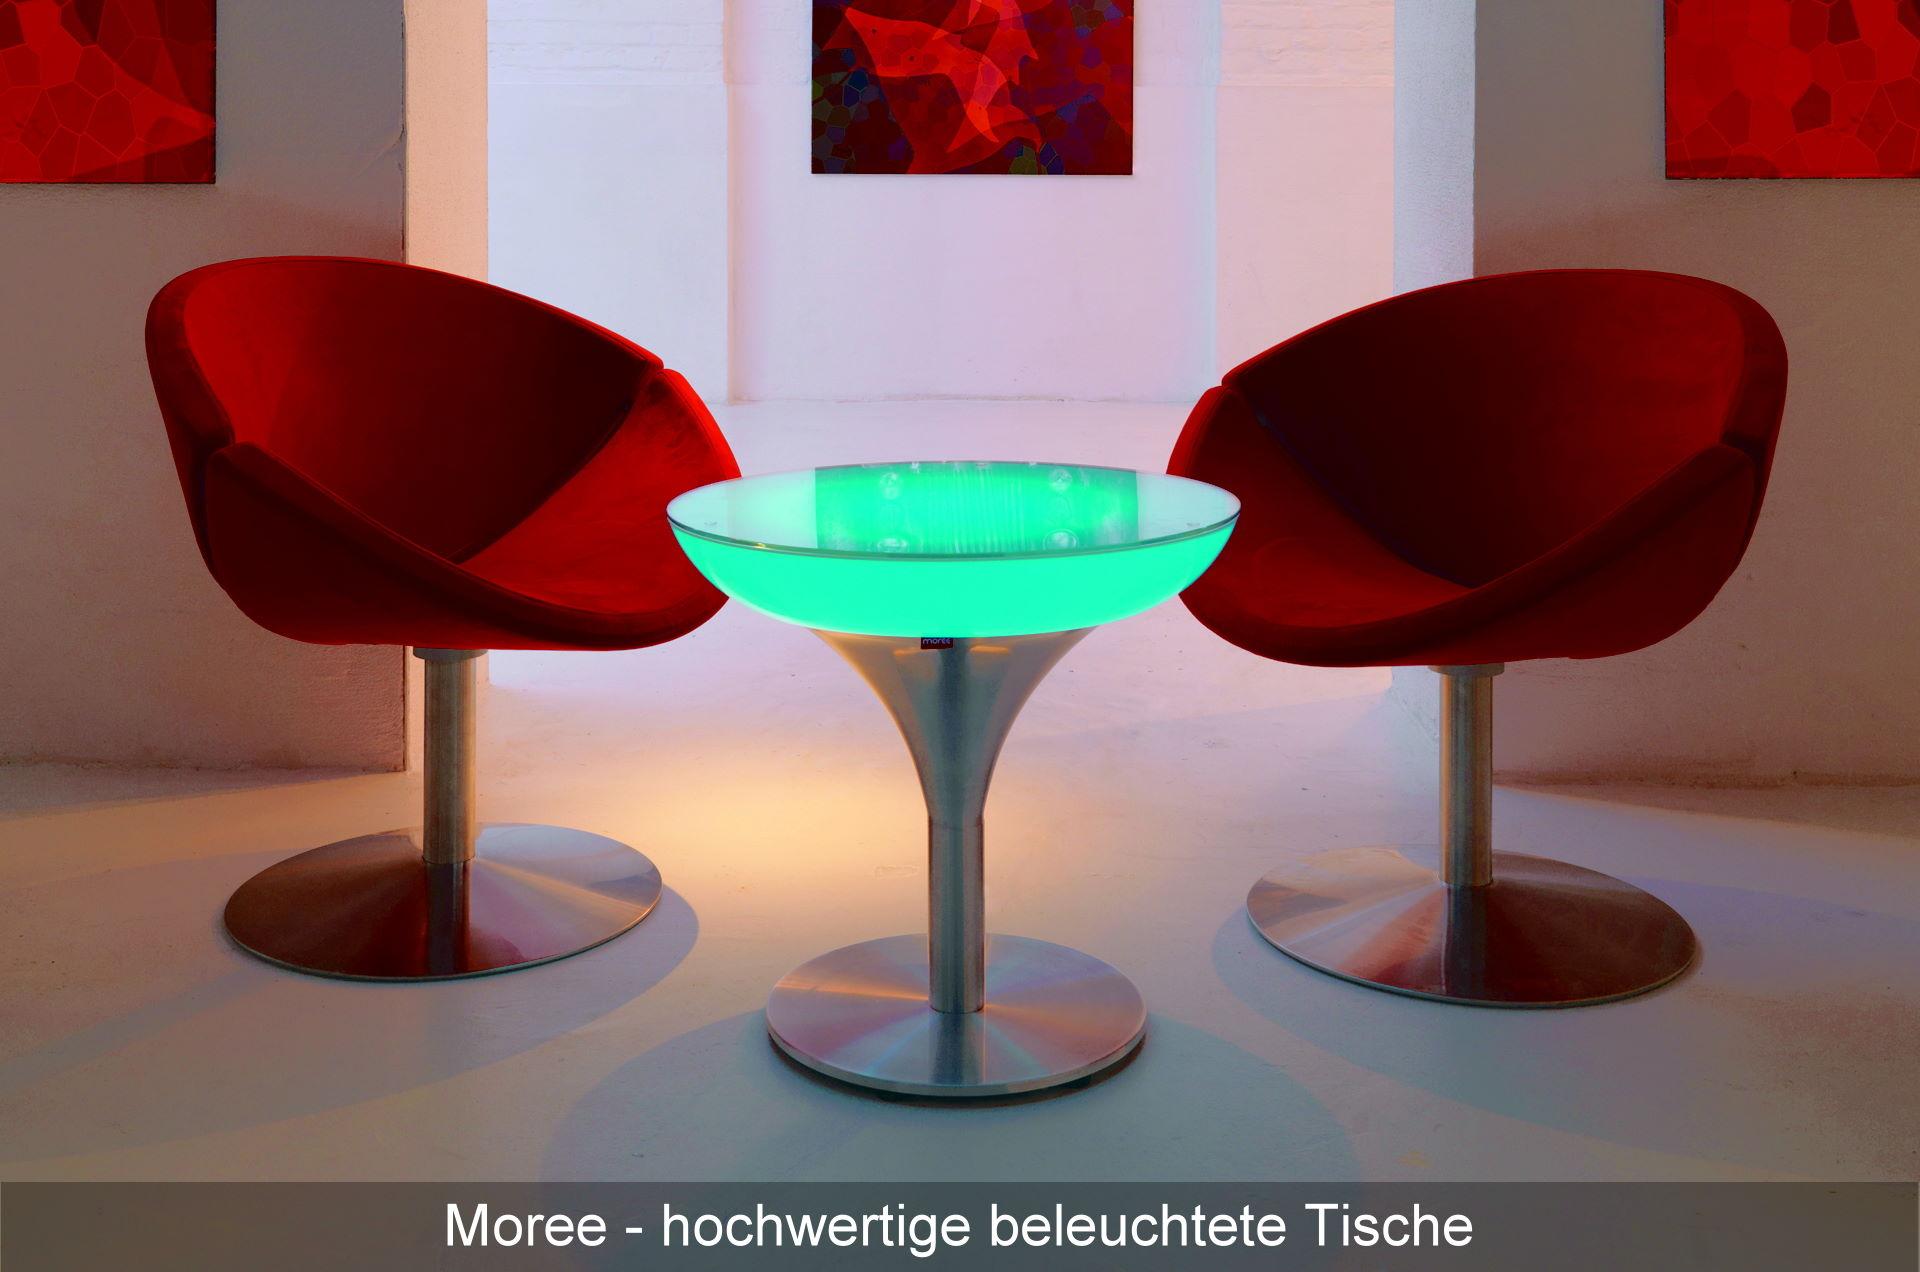 wohn accessoires m bel online kaufen howe deko online shop. Black Bedroom Furniture Sets. Home Design Ideas